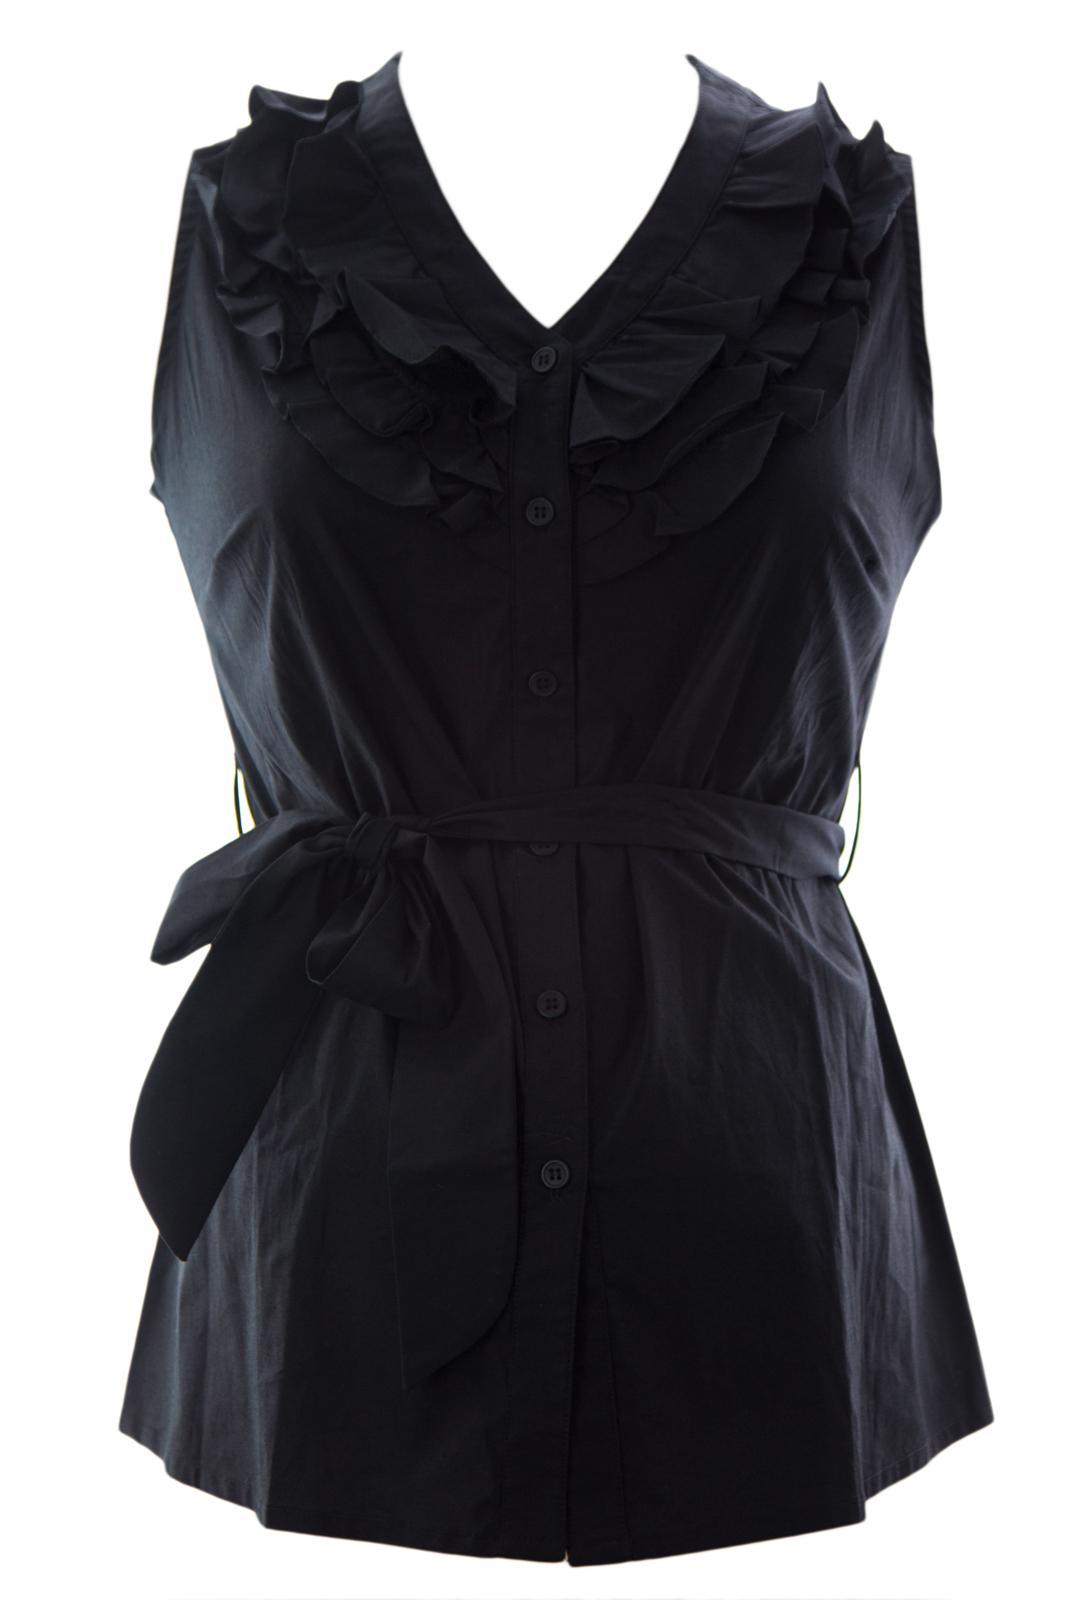 Olian Women's Sleeveless Ruffle Front Maternity Blouse X-Small Black